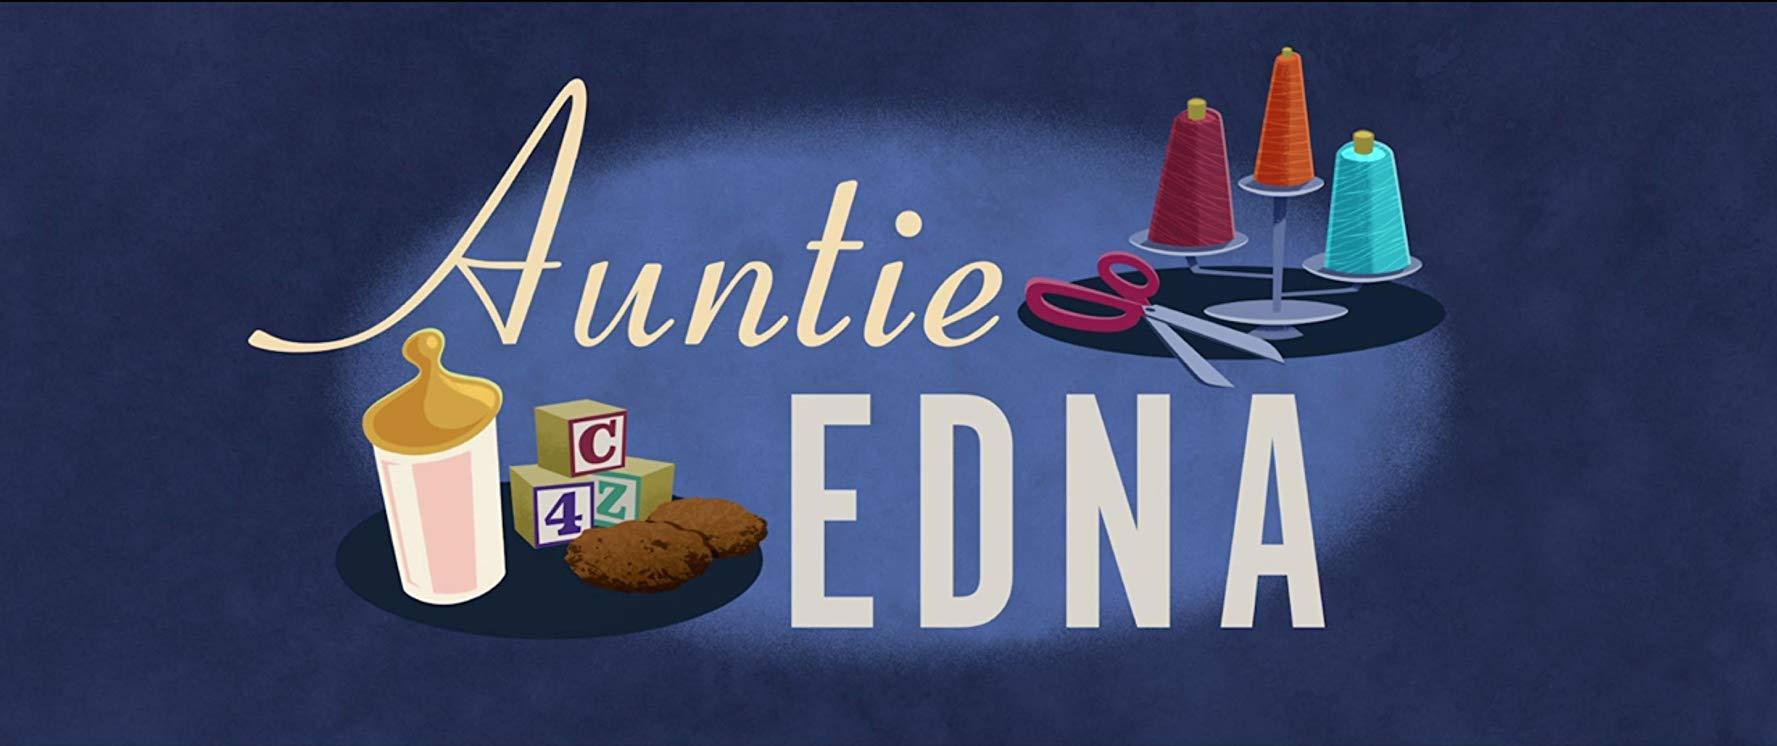 Auntie Edna 2018 720p BluRay x264-FLAME